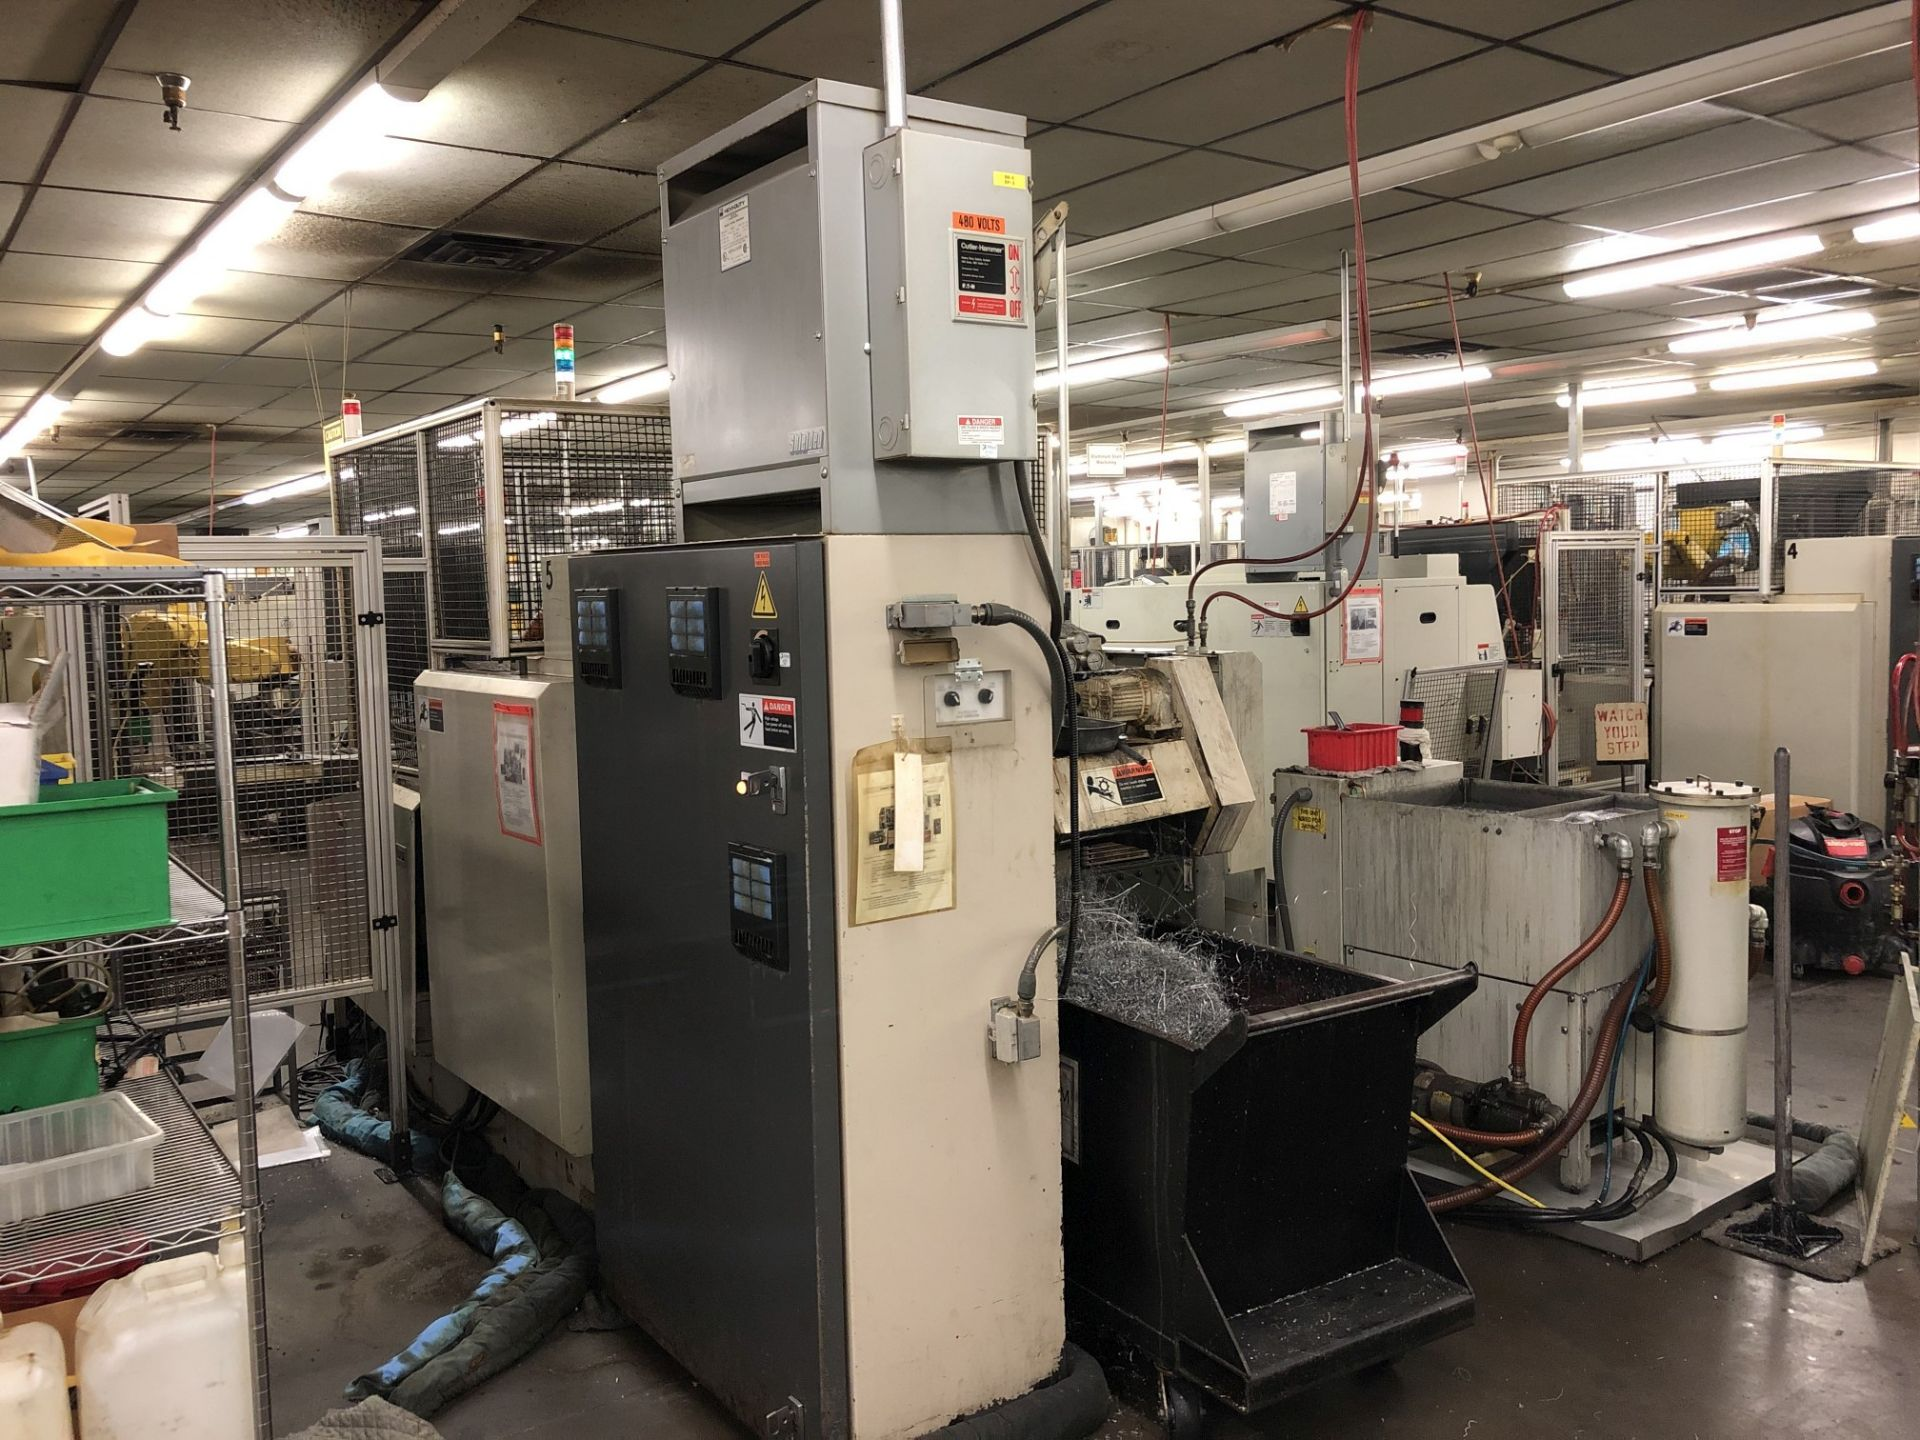 1999 Kitako MT4-200M Multi-Spindle CNC Turning Mill - Image 11 of 15